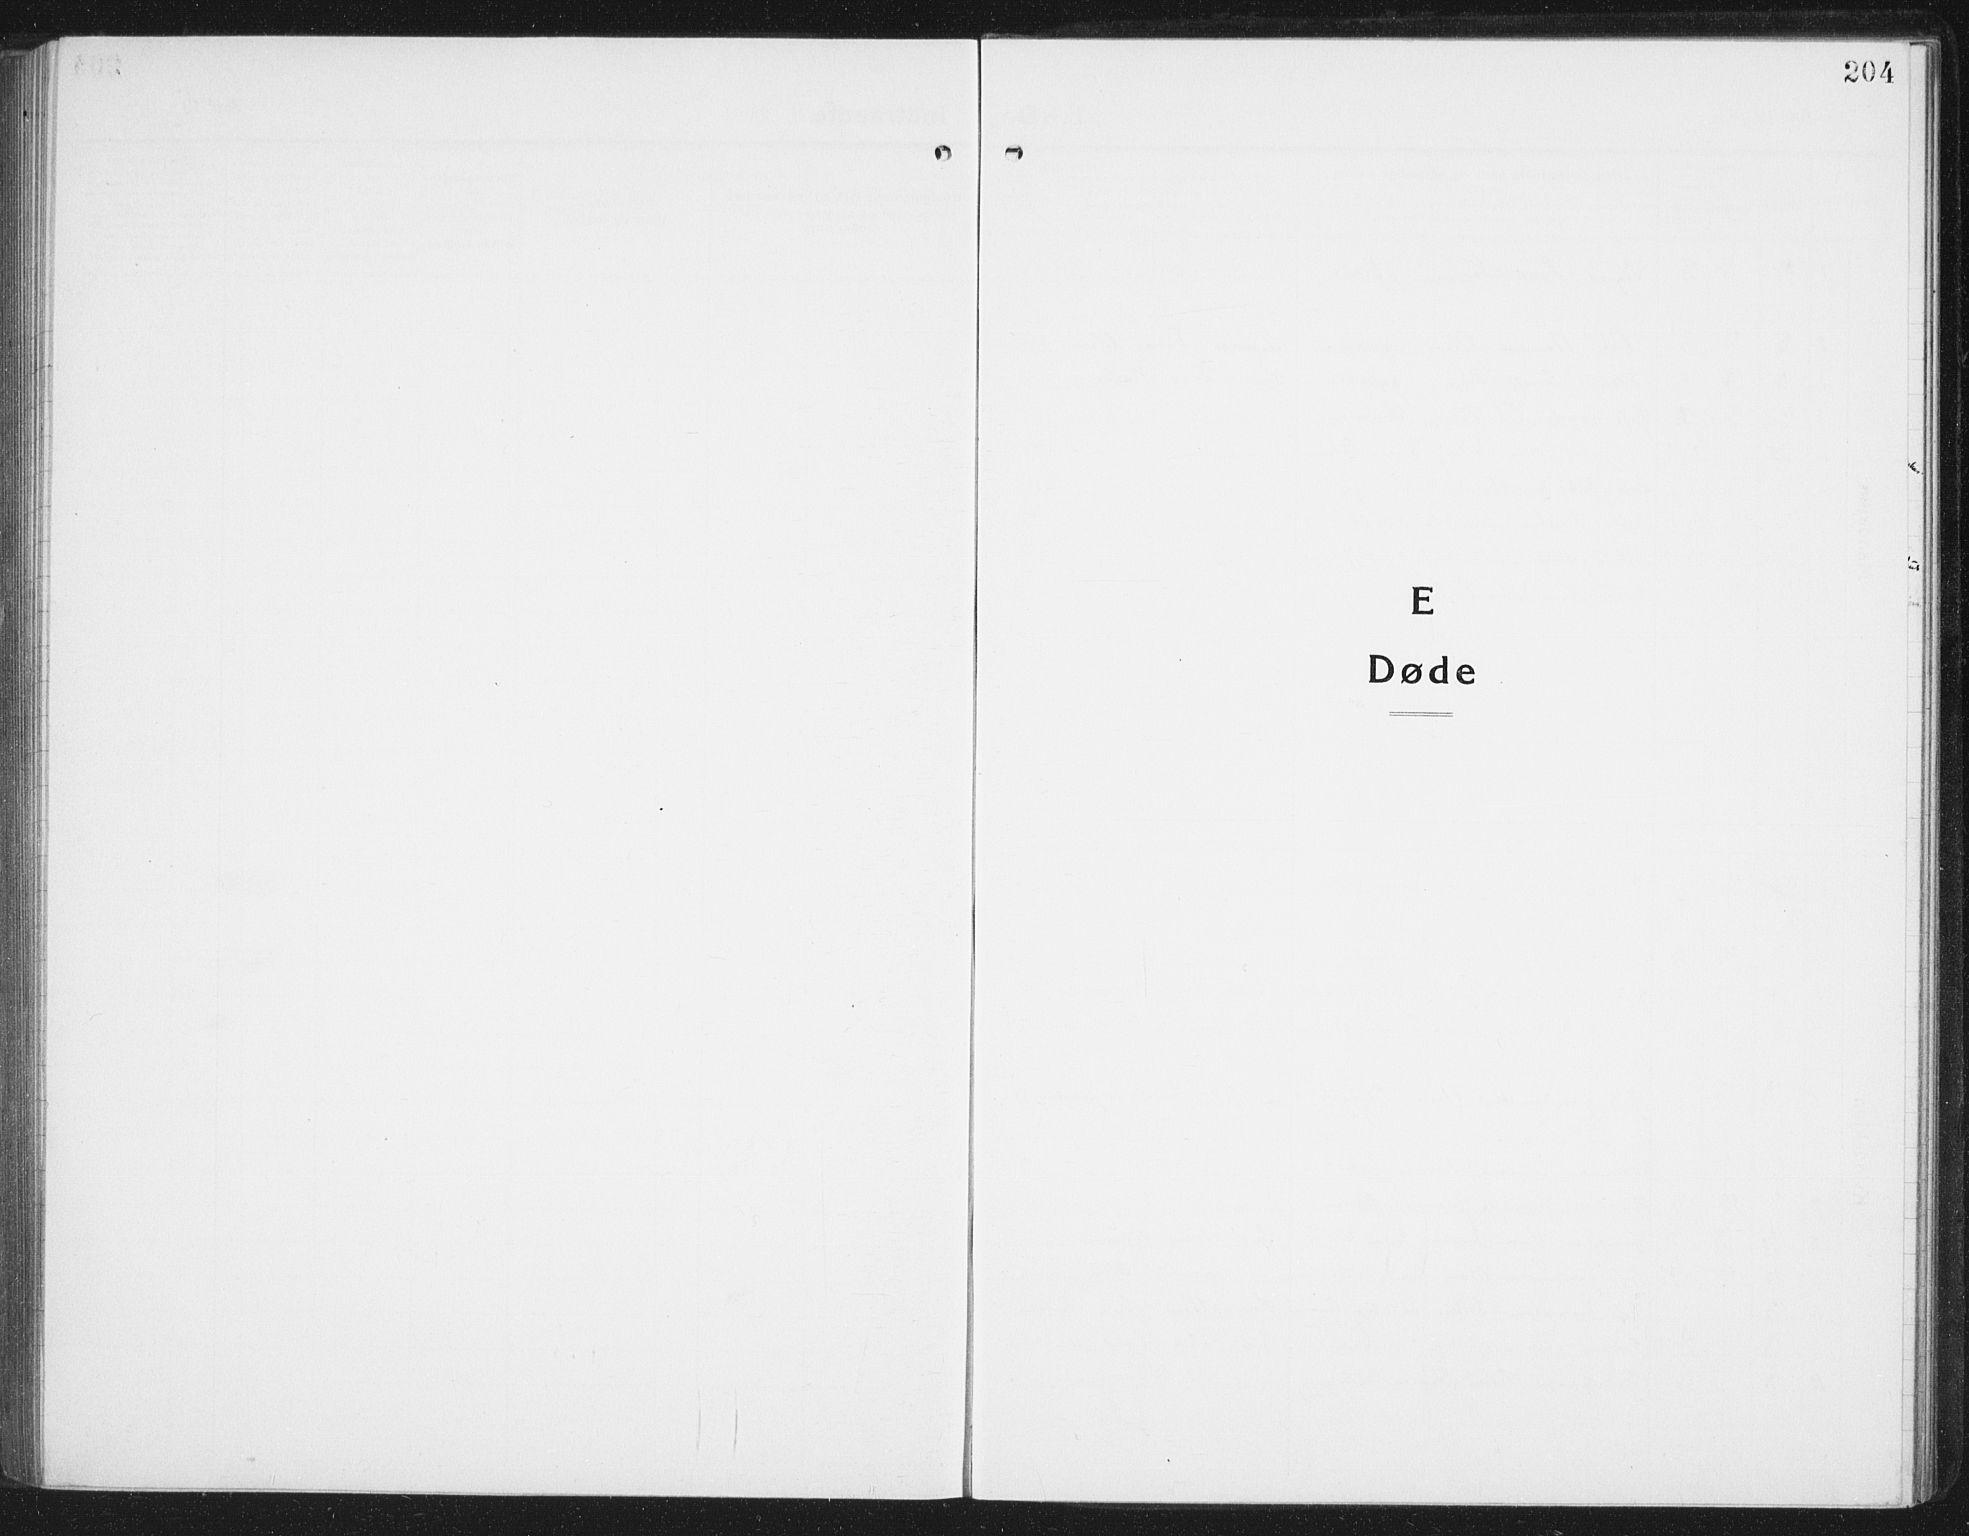 SAT, Ministerialprotokoller, klokkerbøker og fødselsregistre - Nordland, 898/L1428: Klokkerbok nr. 898C03, 1918-1938, s. 204